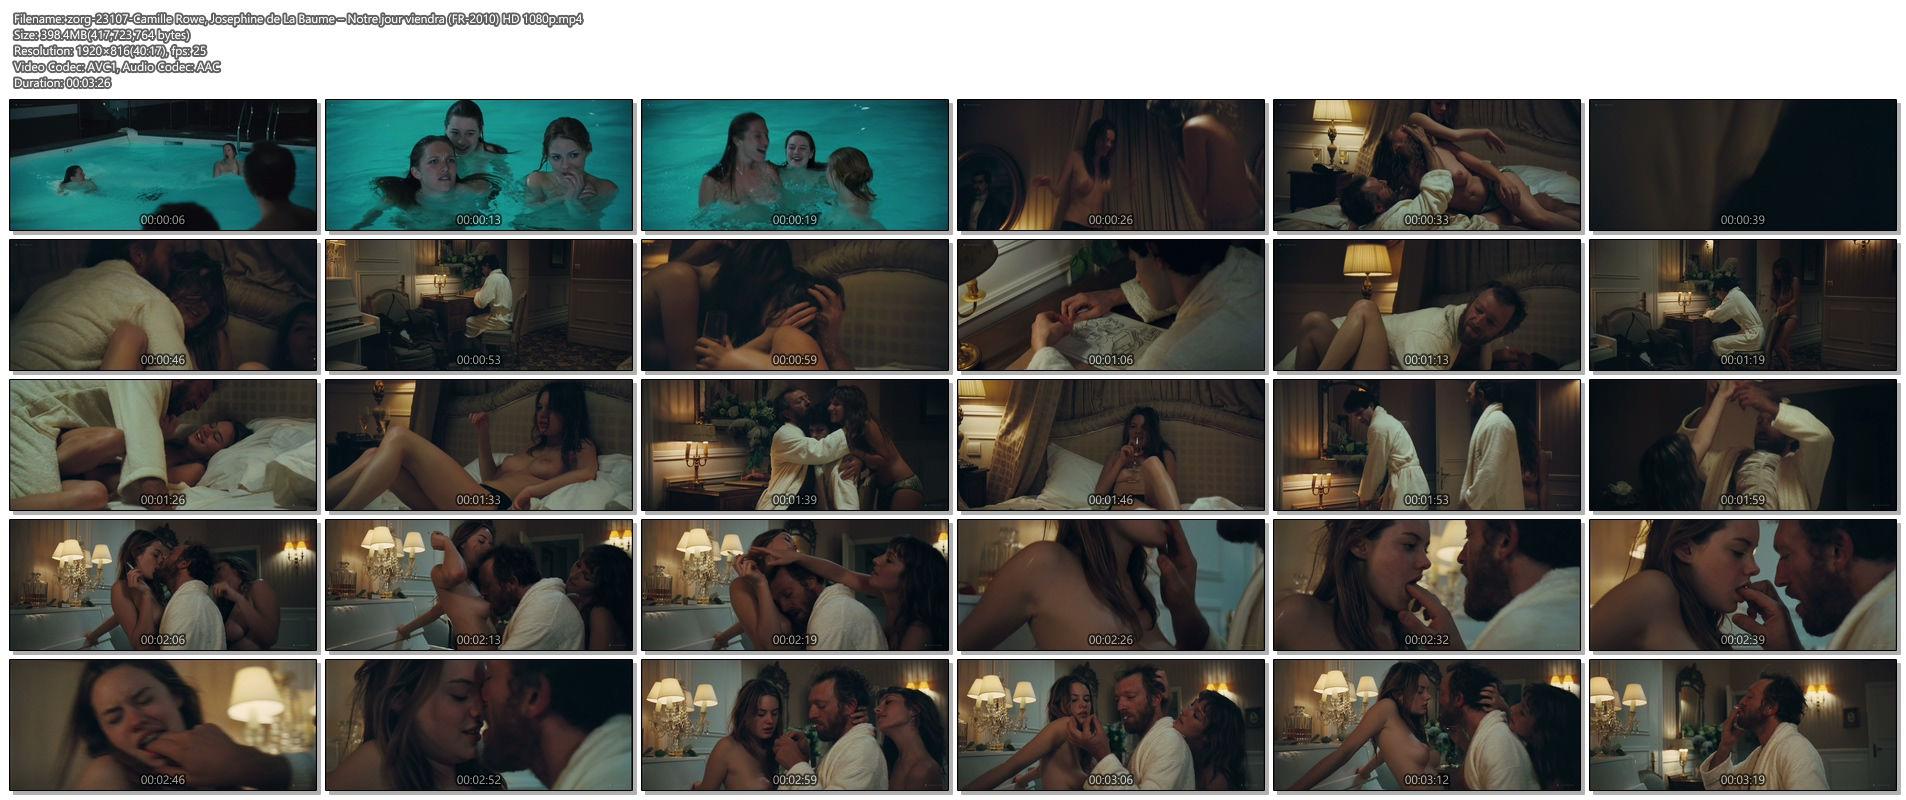 Camille Rowe nude and Josephine de La Baume nude sex threesome - Notre jour viendra (FR-2010) HD 1080p BluRay (1)